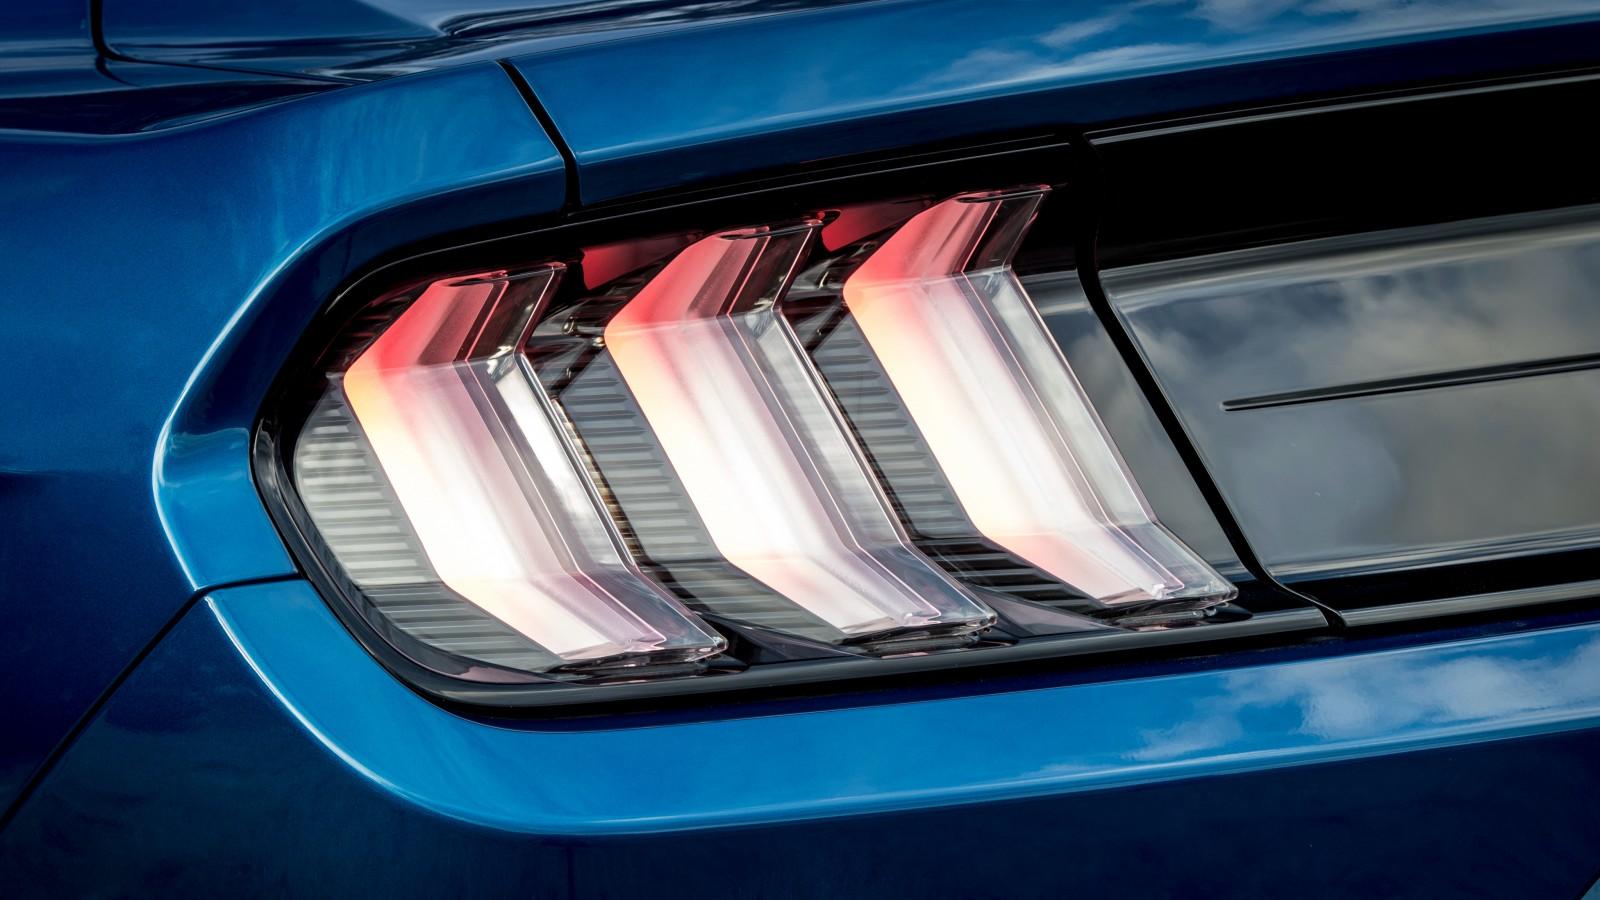 Mustang Wallpaper Iphone X Ford Mustang Led Tail Lights 4k Wallpaper Hd Car